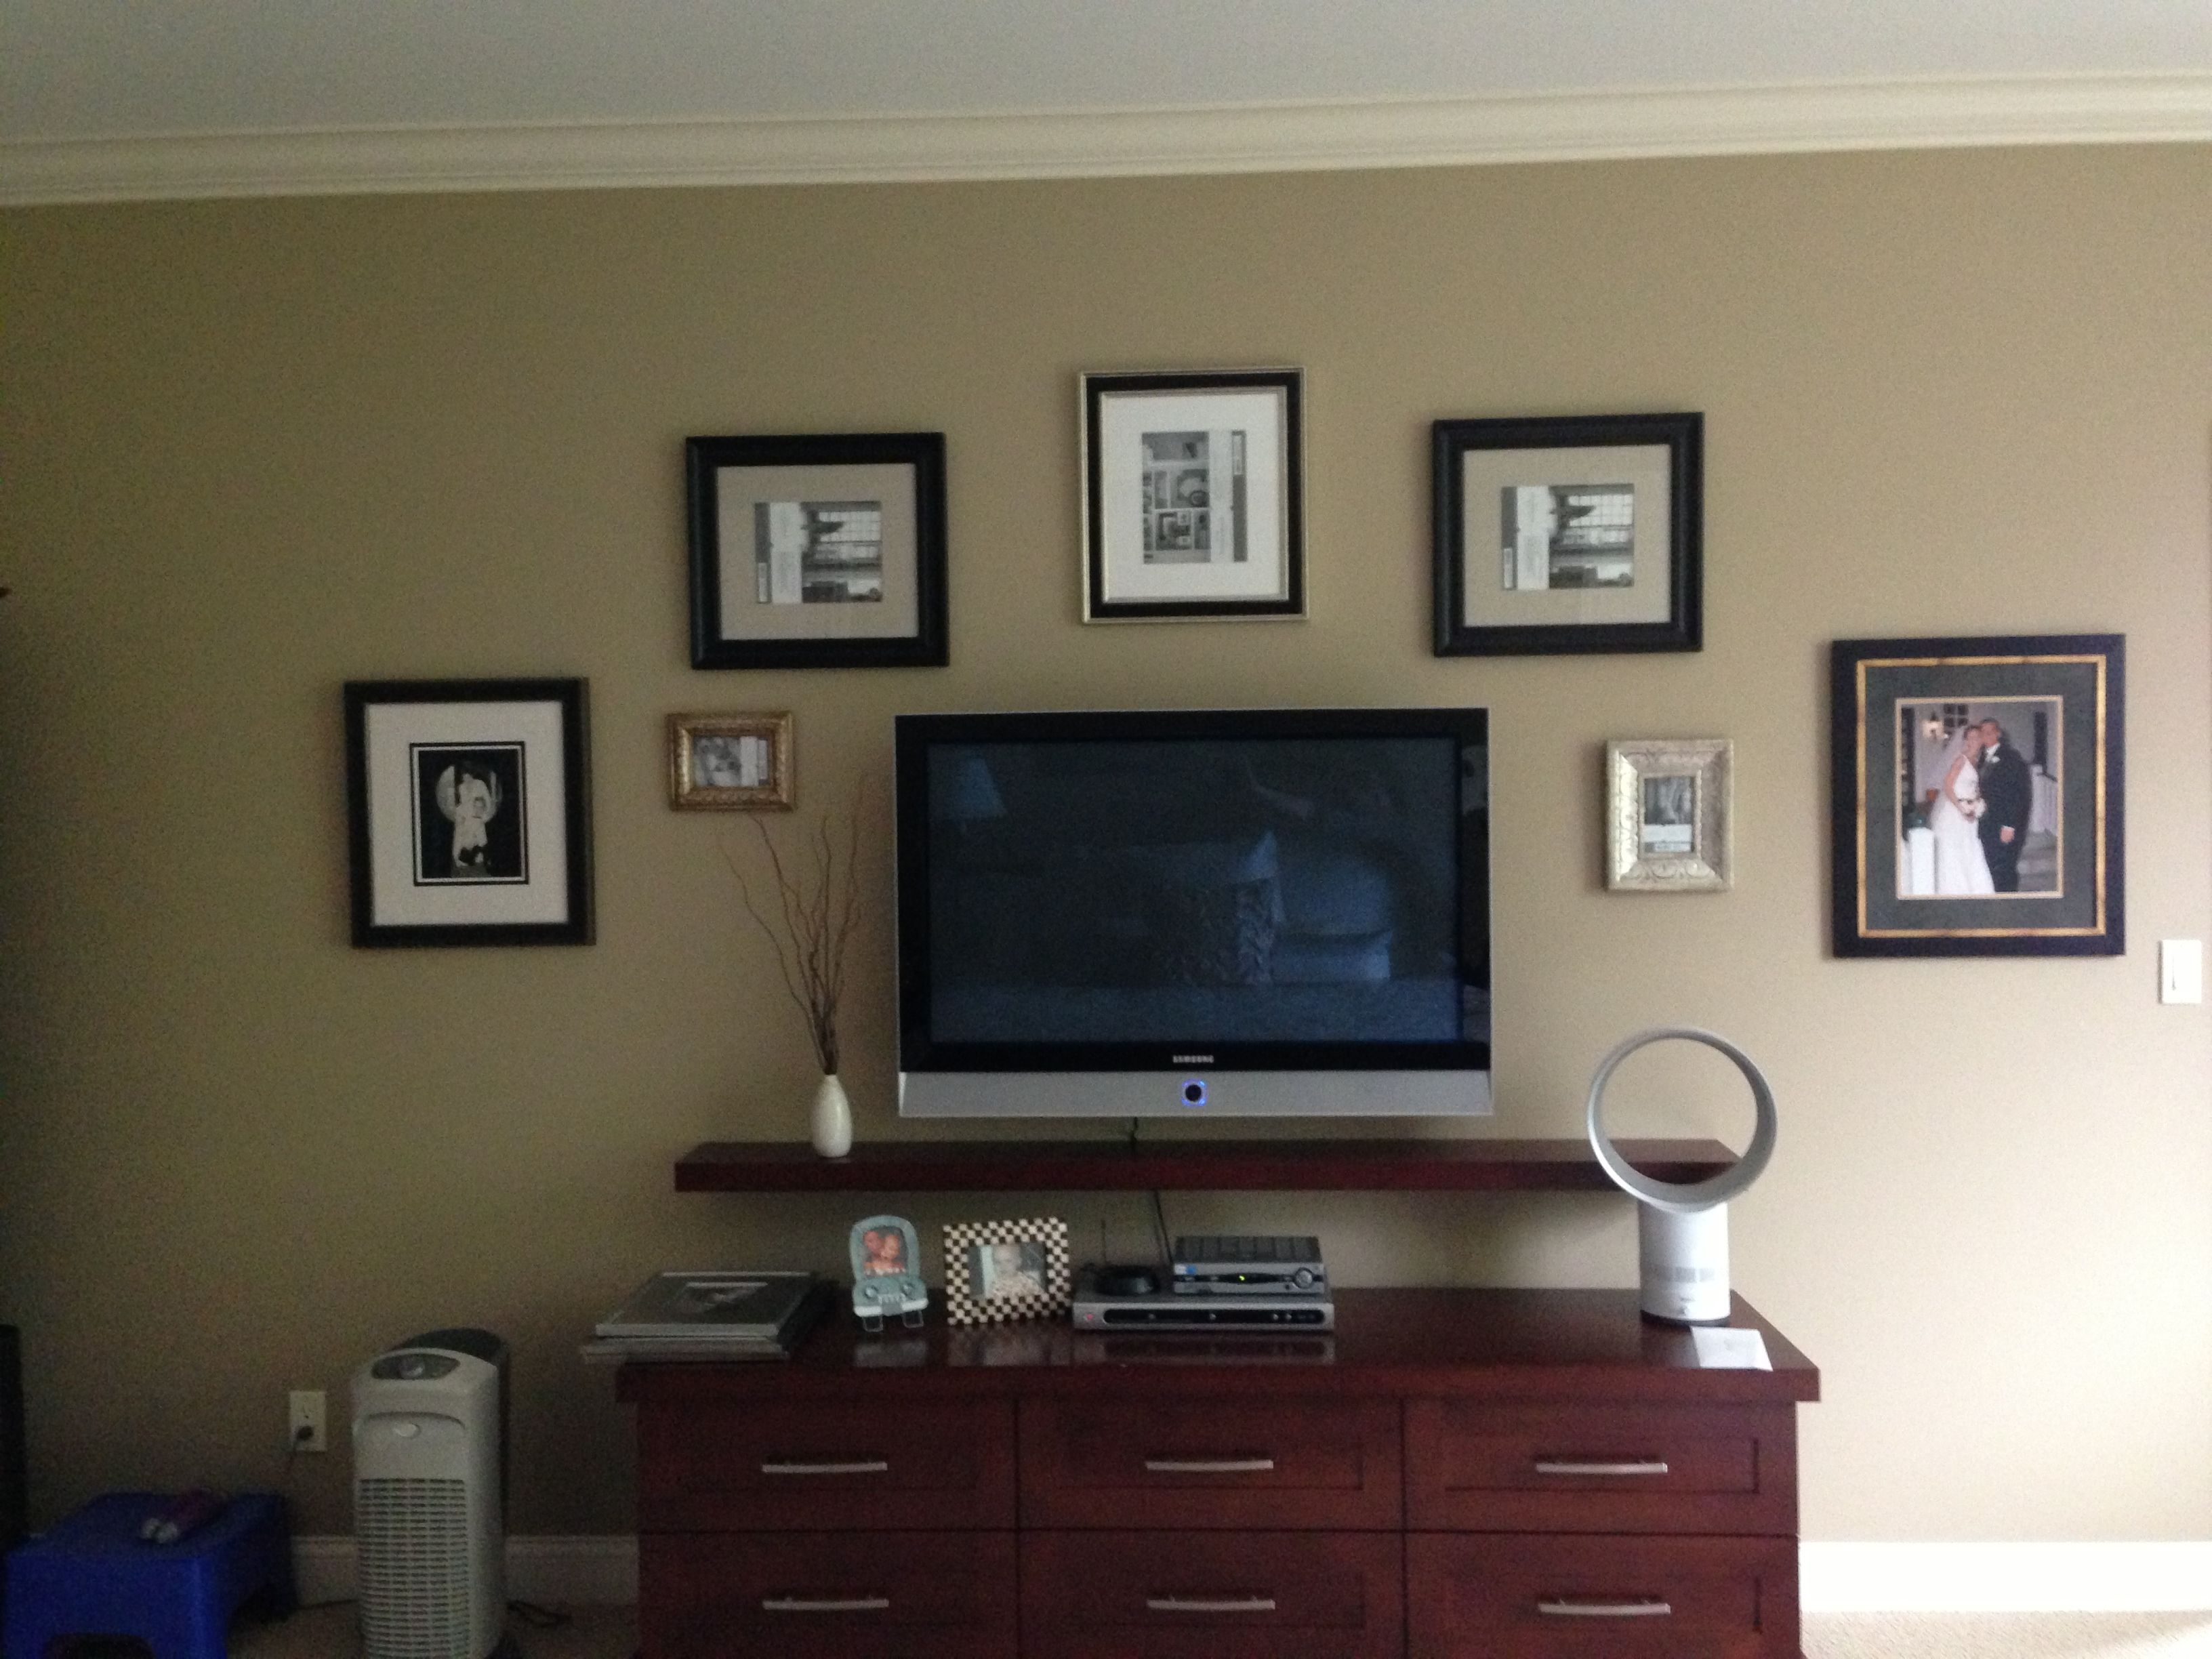 -bishop interiors- Gallery wall, tv wall, frames